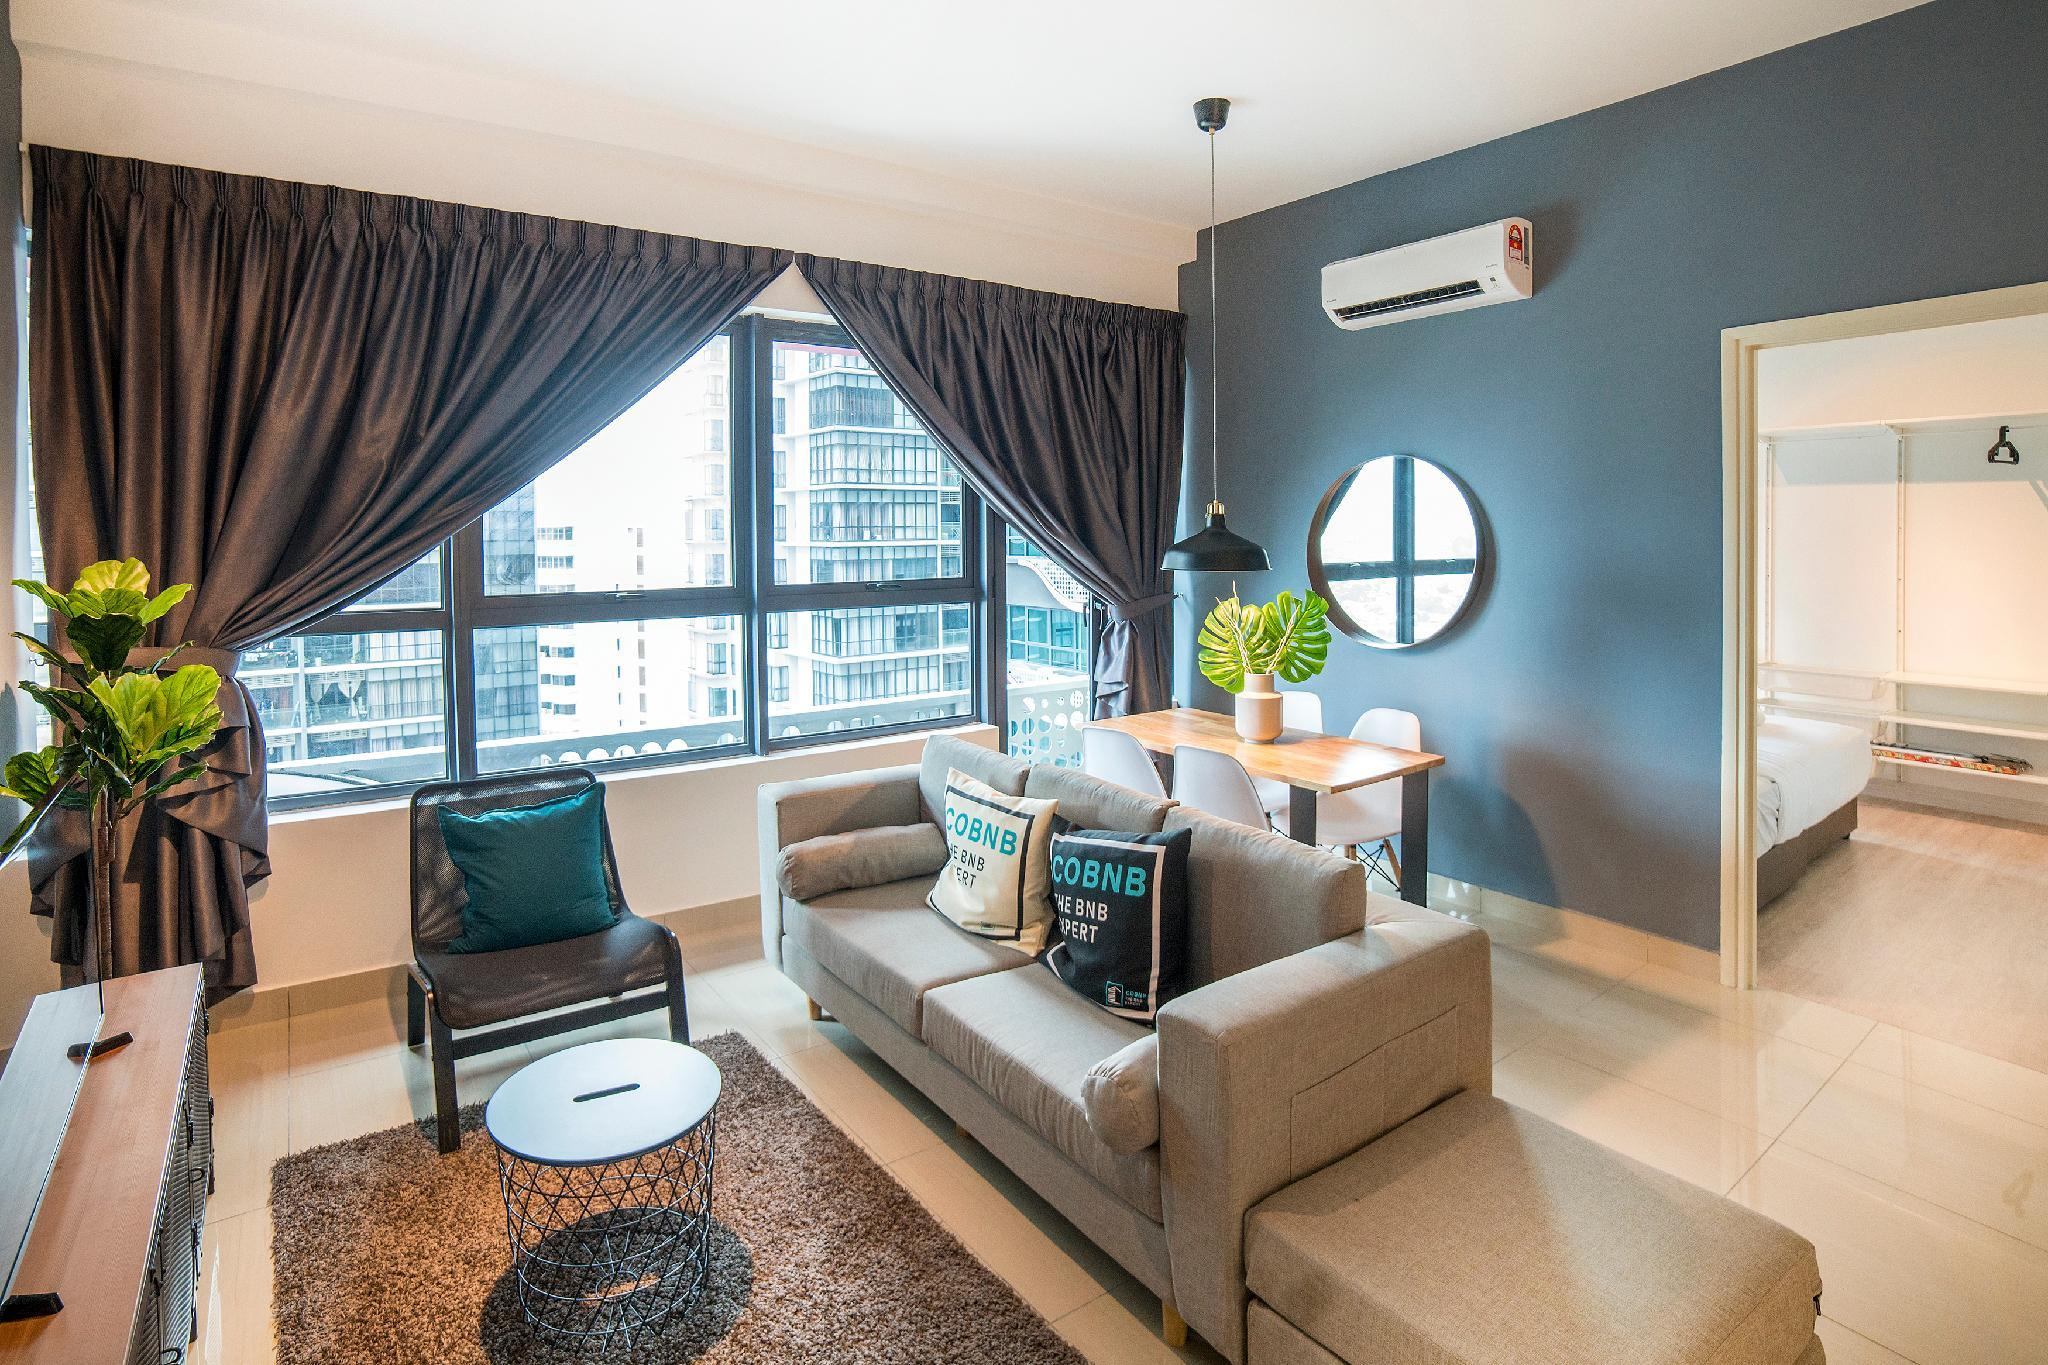 KL Arte Plus Modern Living 2Bed Room@COBNB  AT111